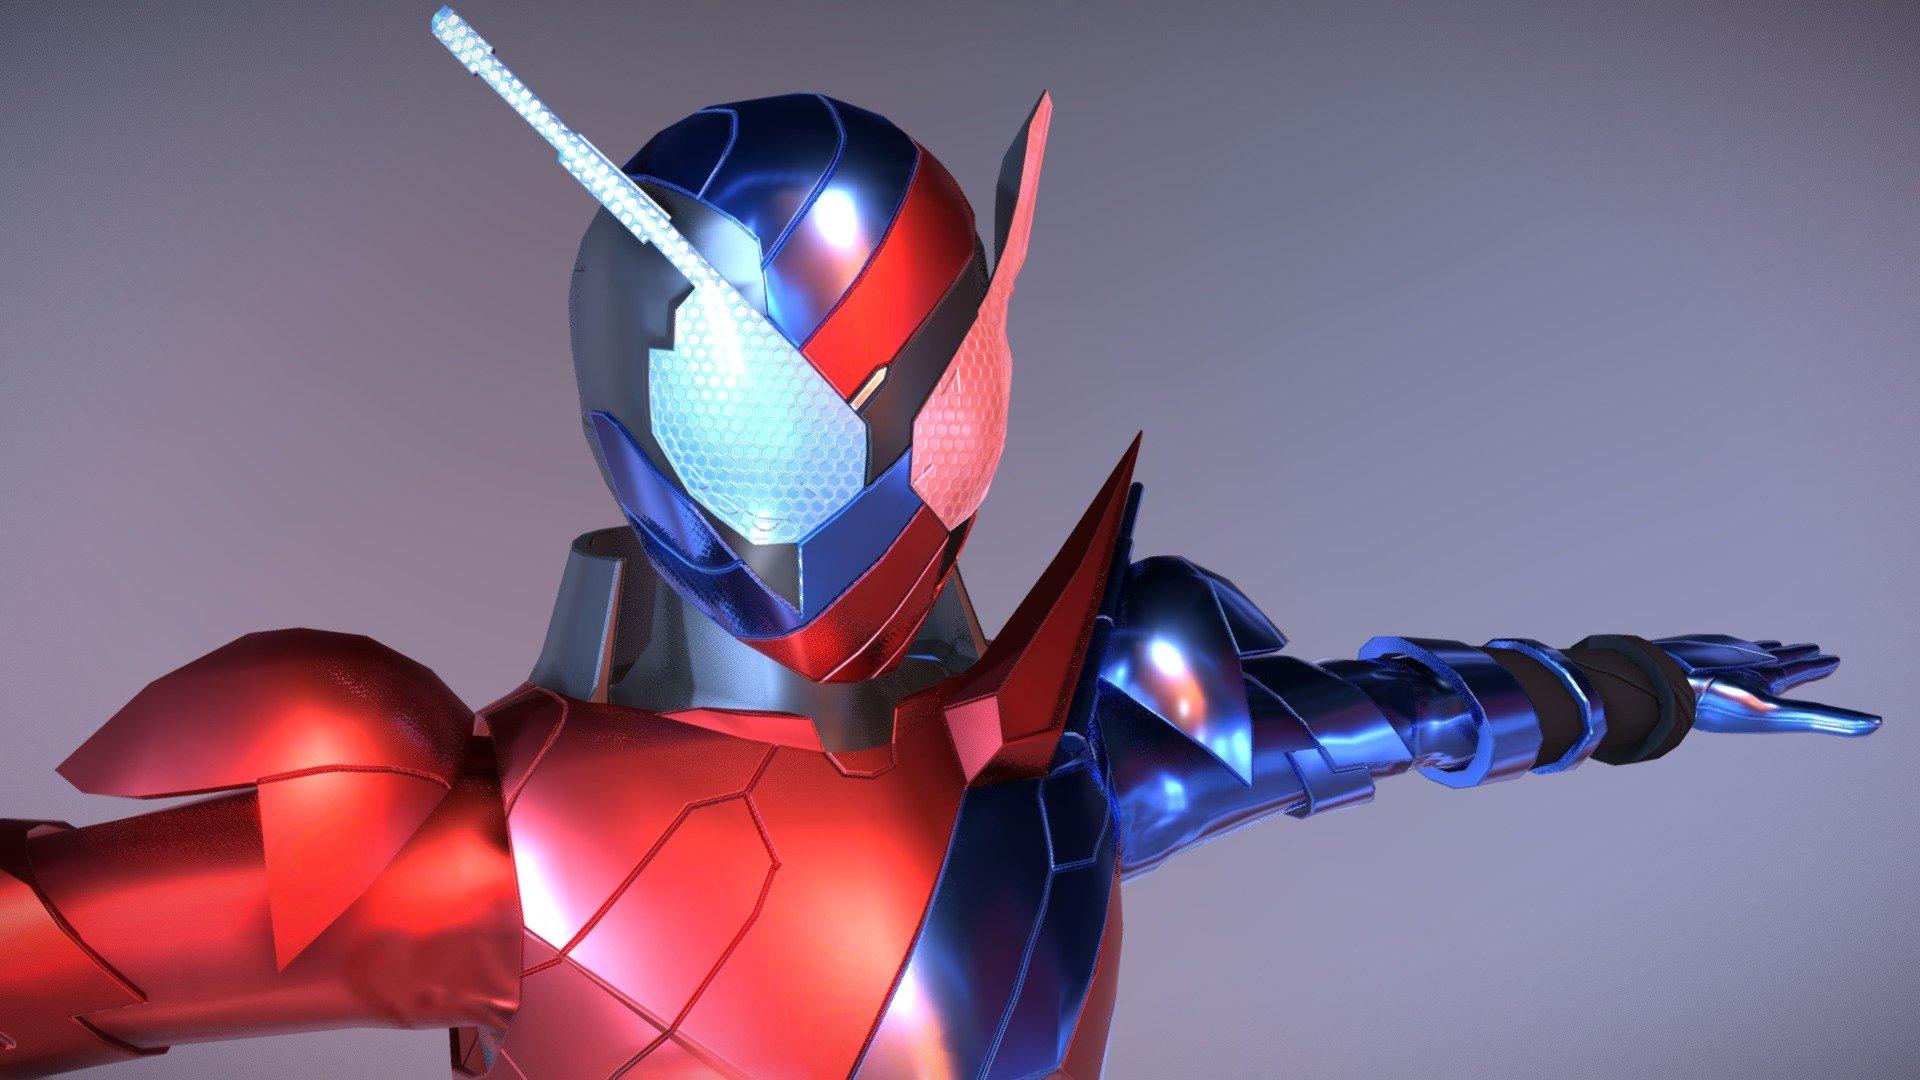 Kamen Rider Build Wip 3d Model By Be03kou Be03kou 0cb3396